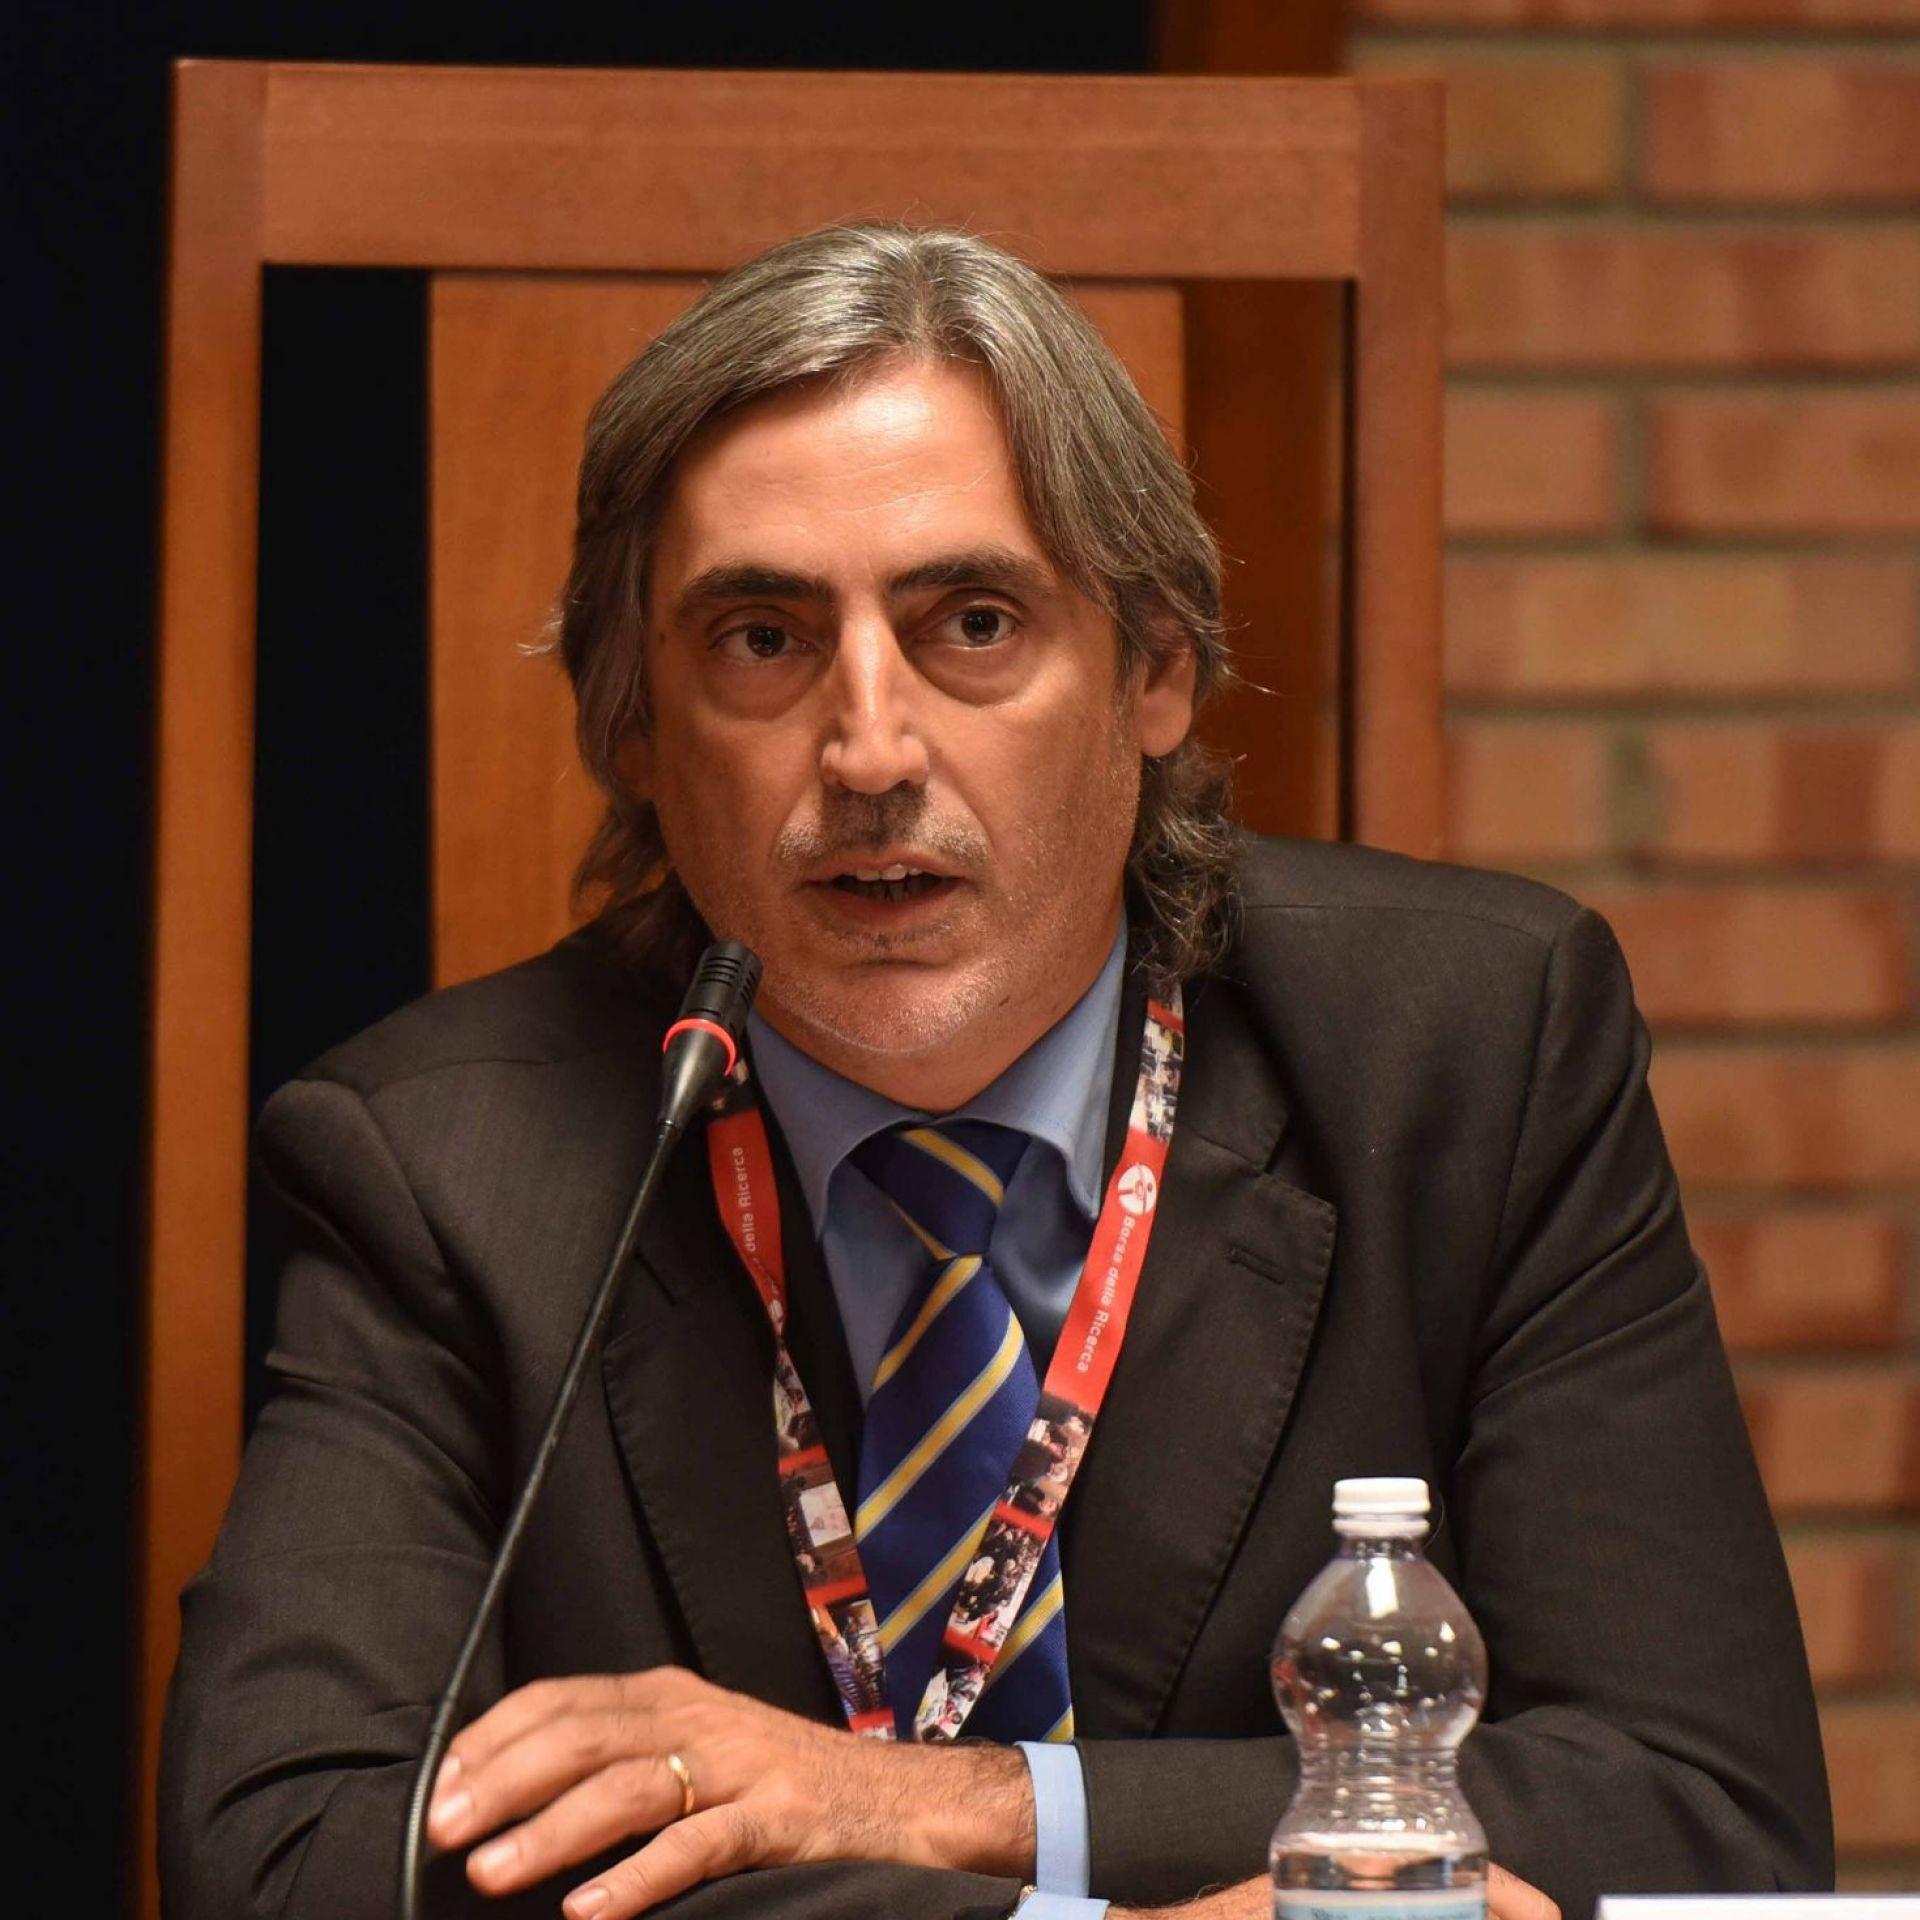 Pietro Campiglia